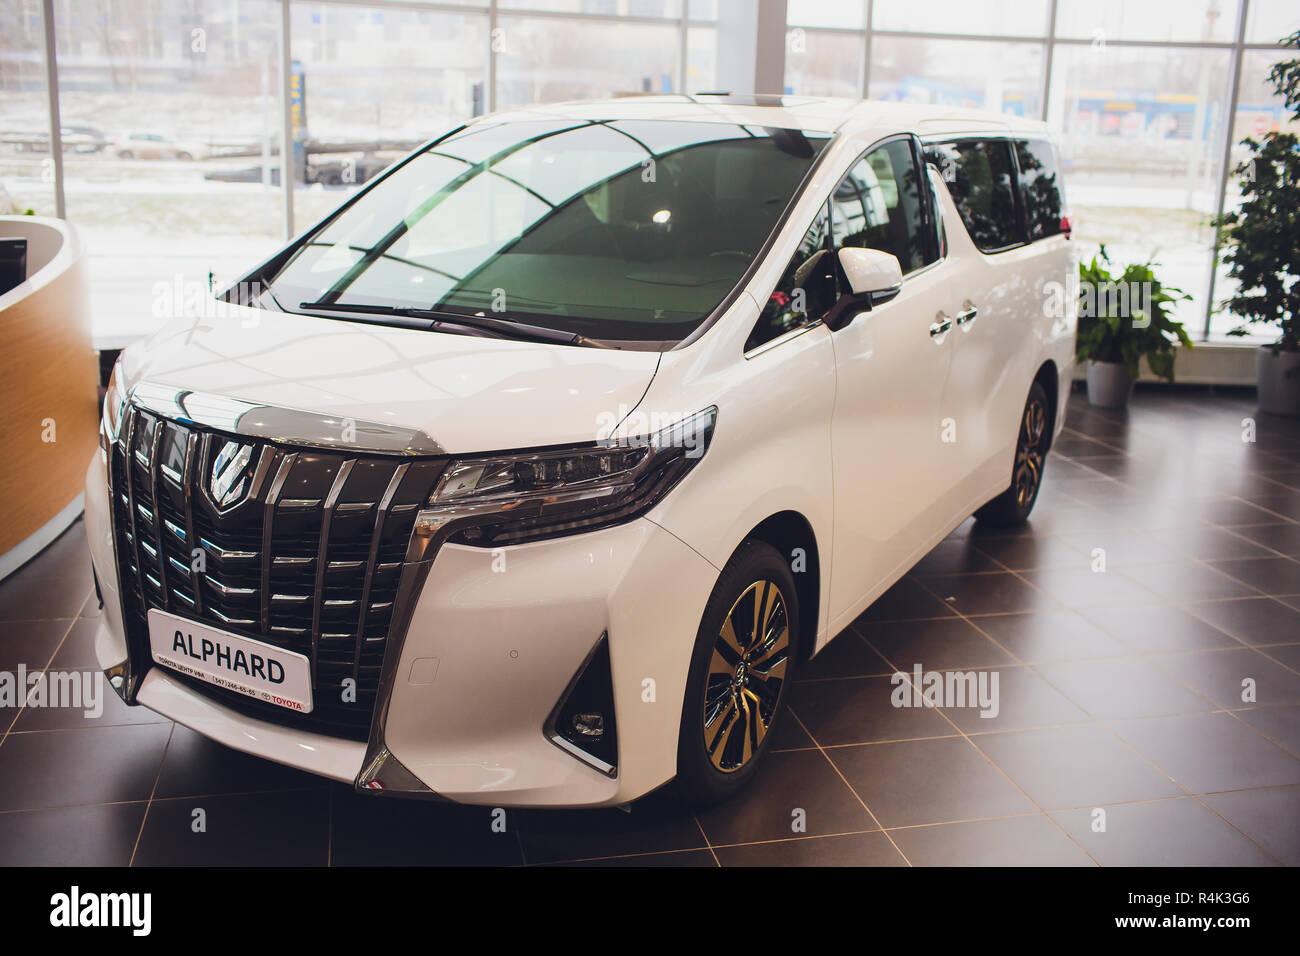 Kekurangan Toyota Alphard 2018 Top Model Tahun Ini